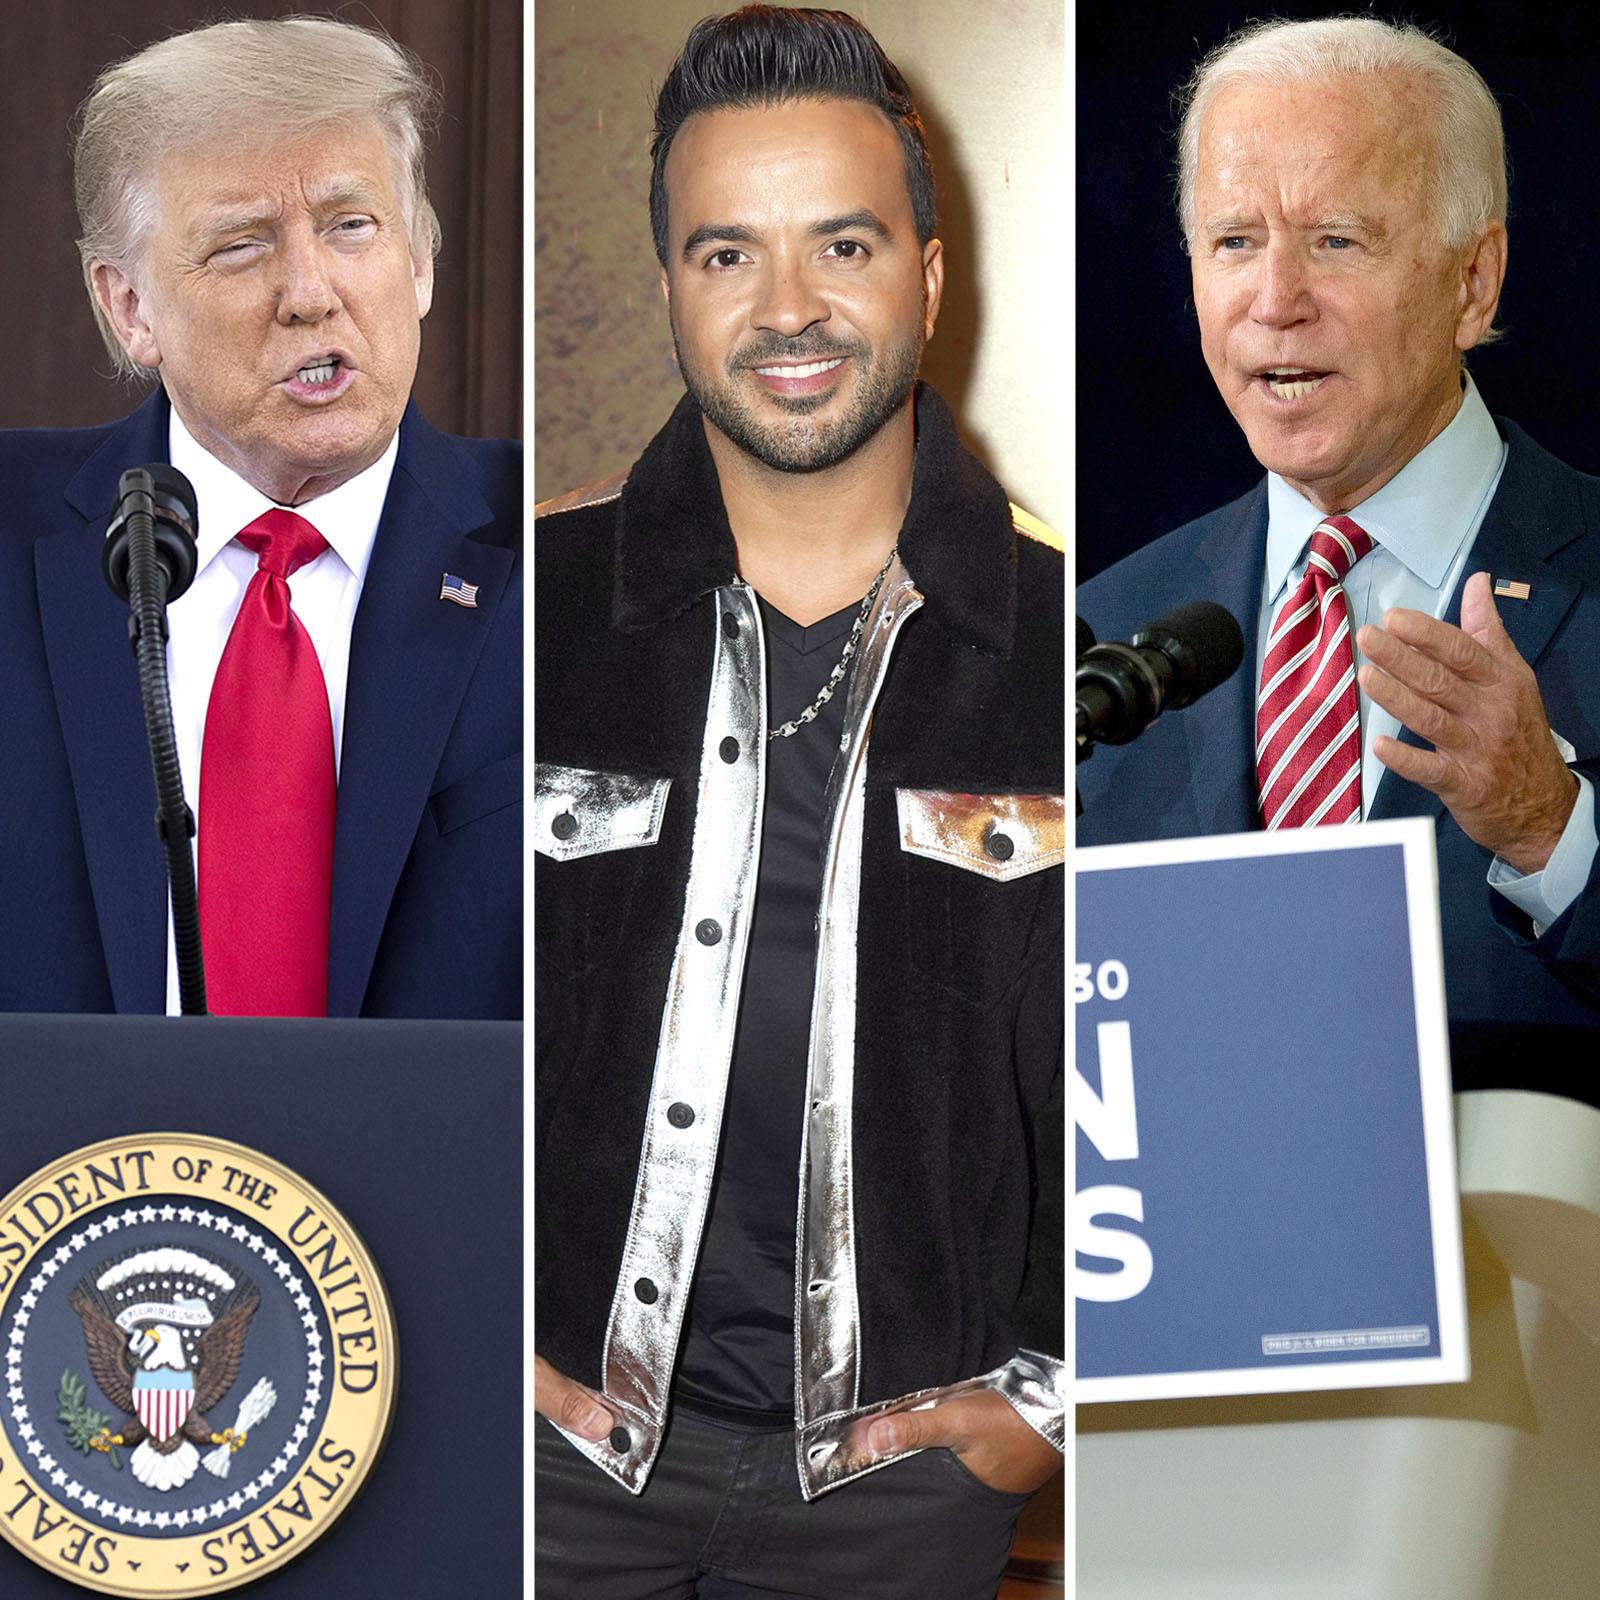 Donald Trump, Luis Fonsi y Joe Biden